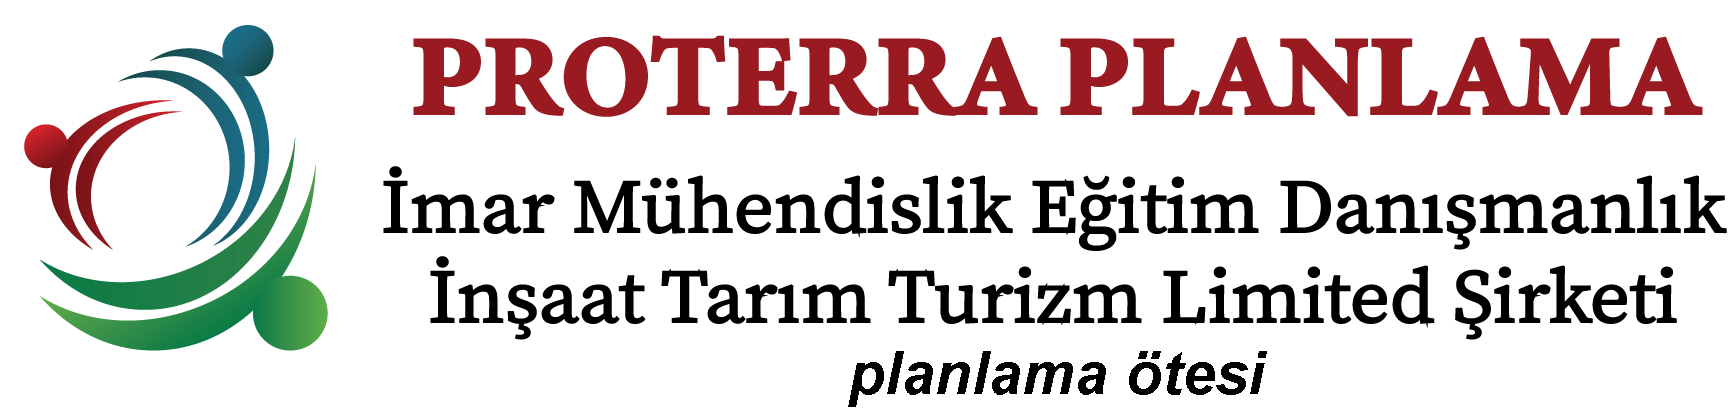 kirmizi-logo-yeni